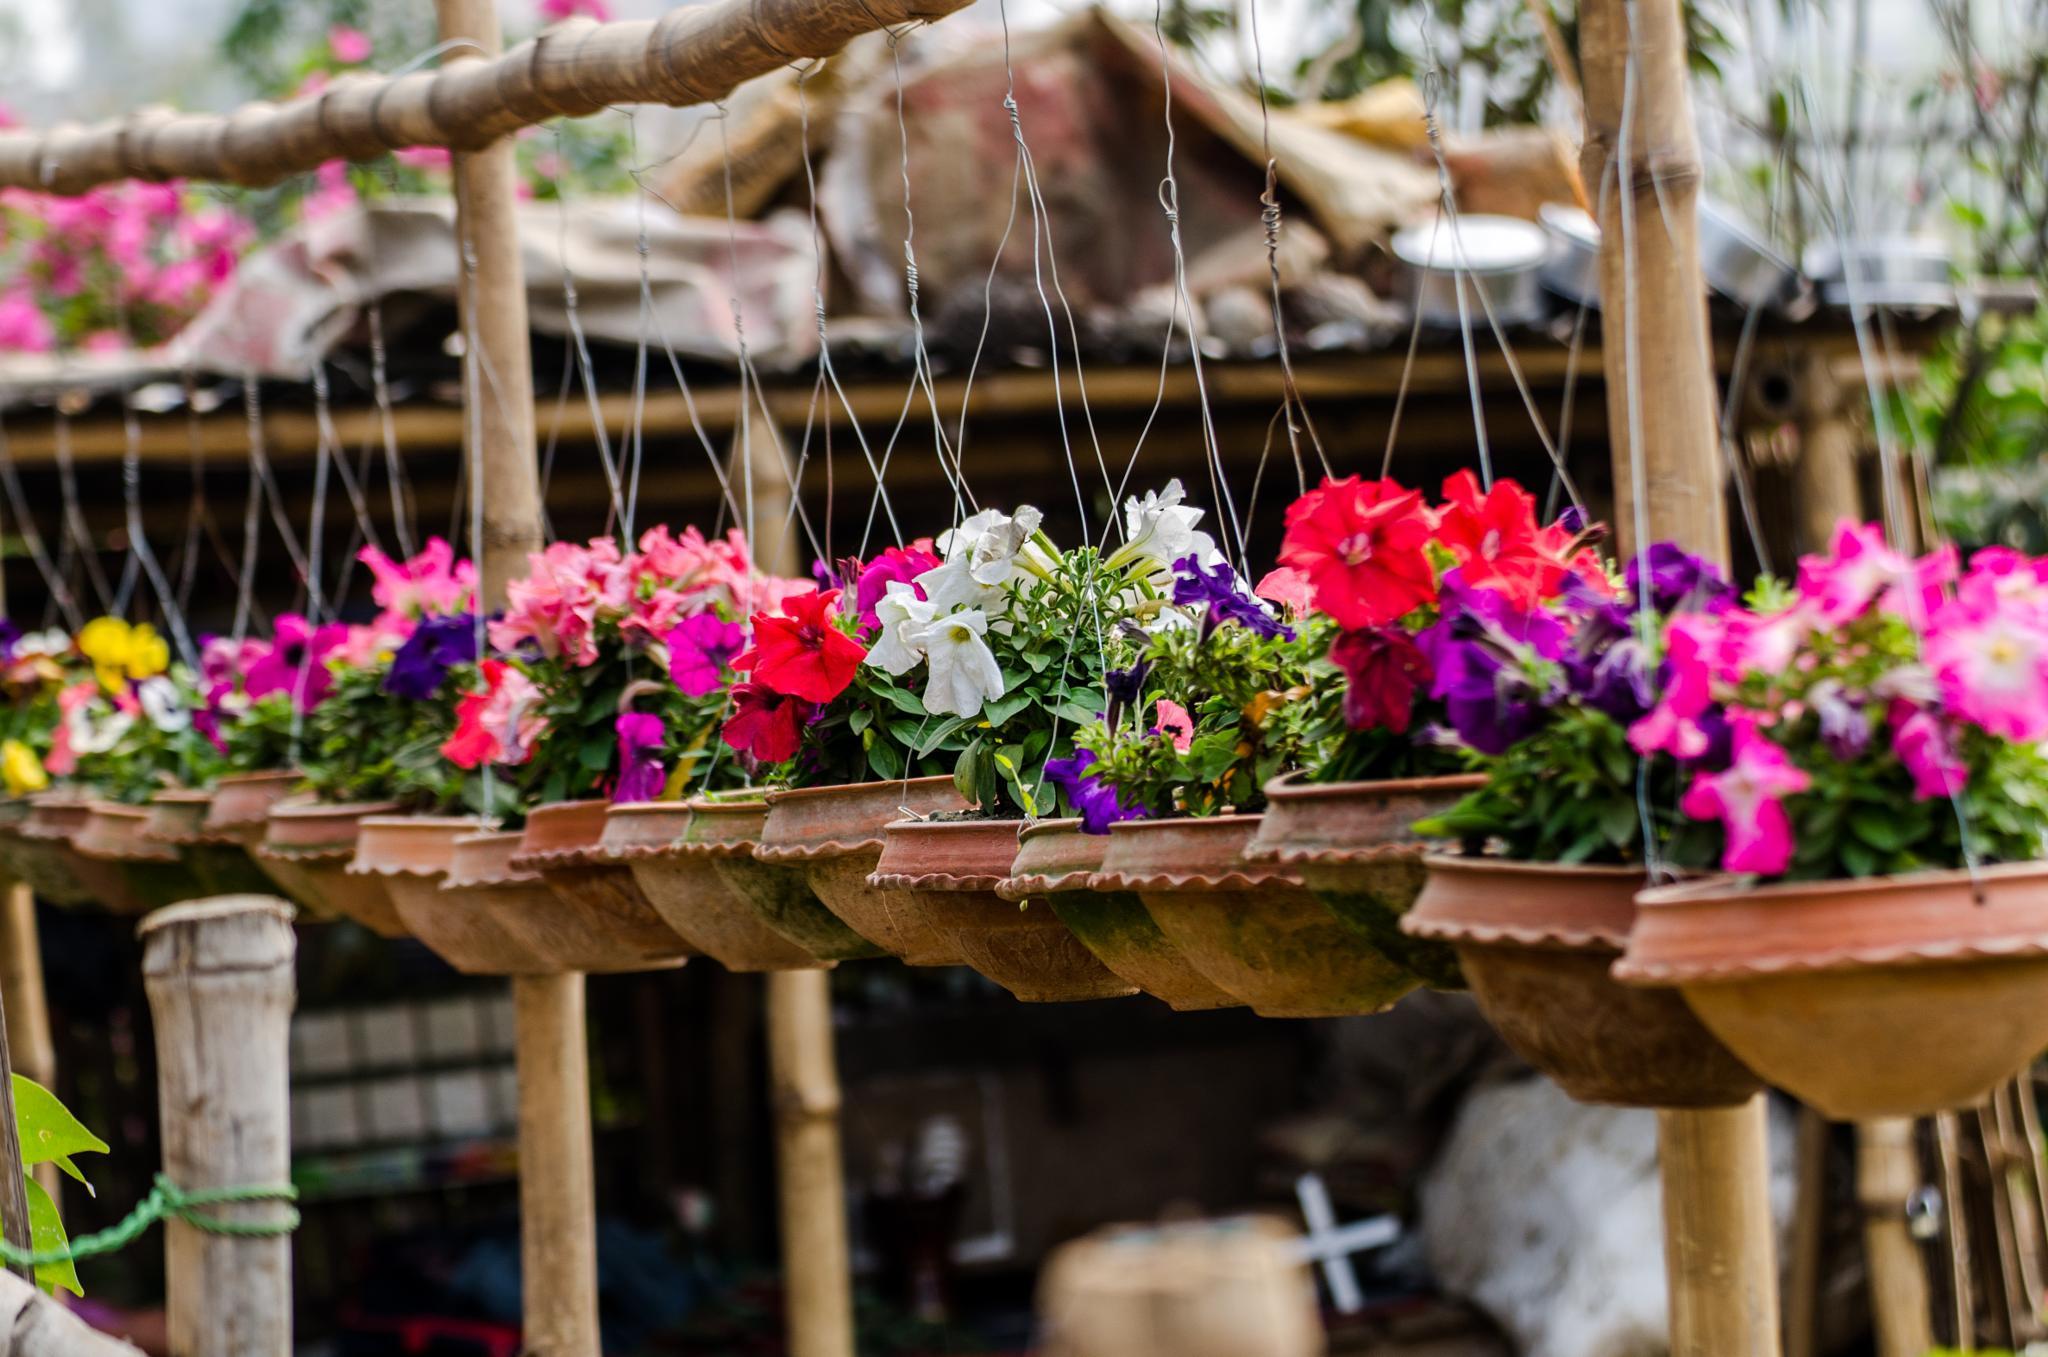 Flower Shop by Mahbub Afzal Khan